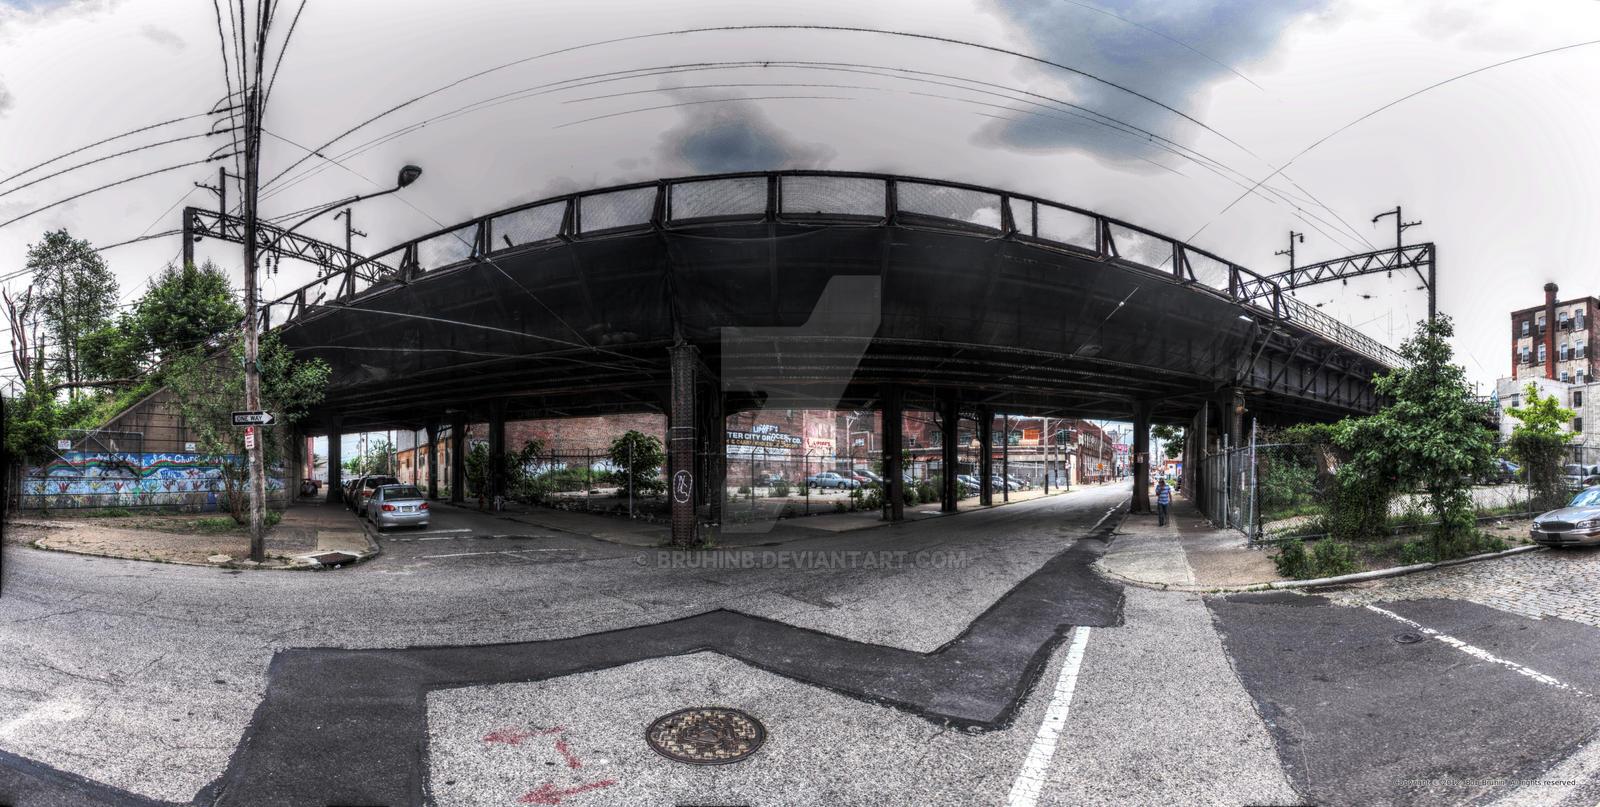 Panorama 1700 hdr pregamma 1 mantiuk contrast  by bruhinb